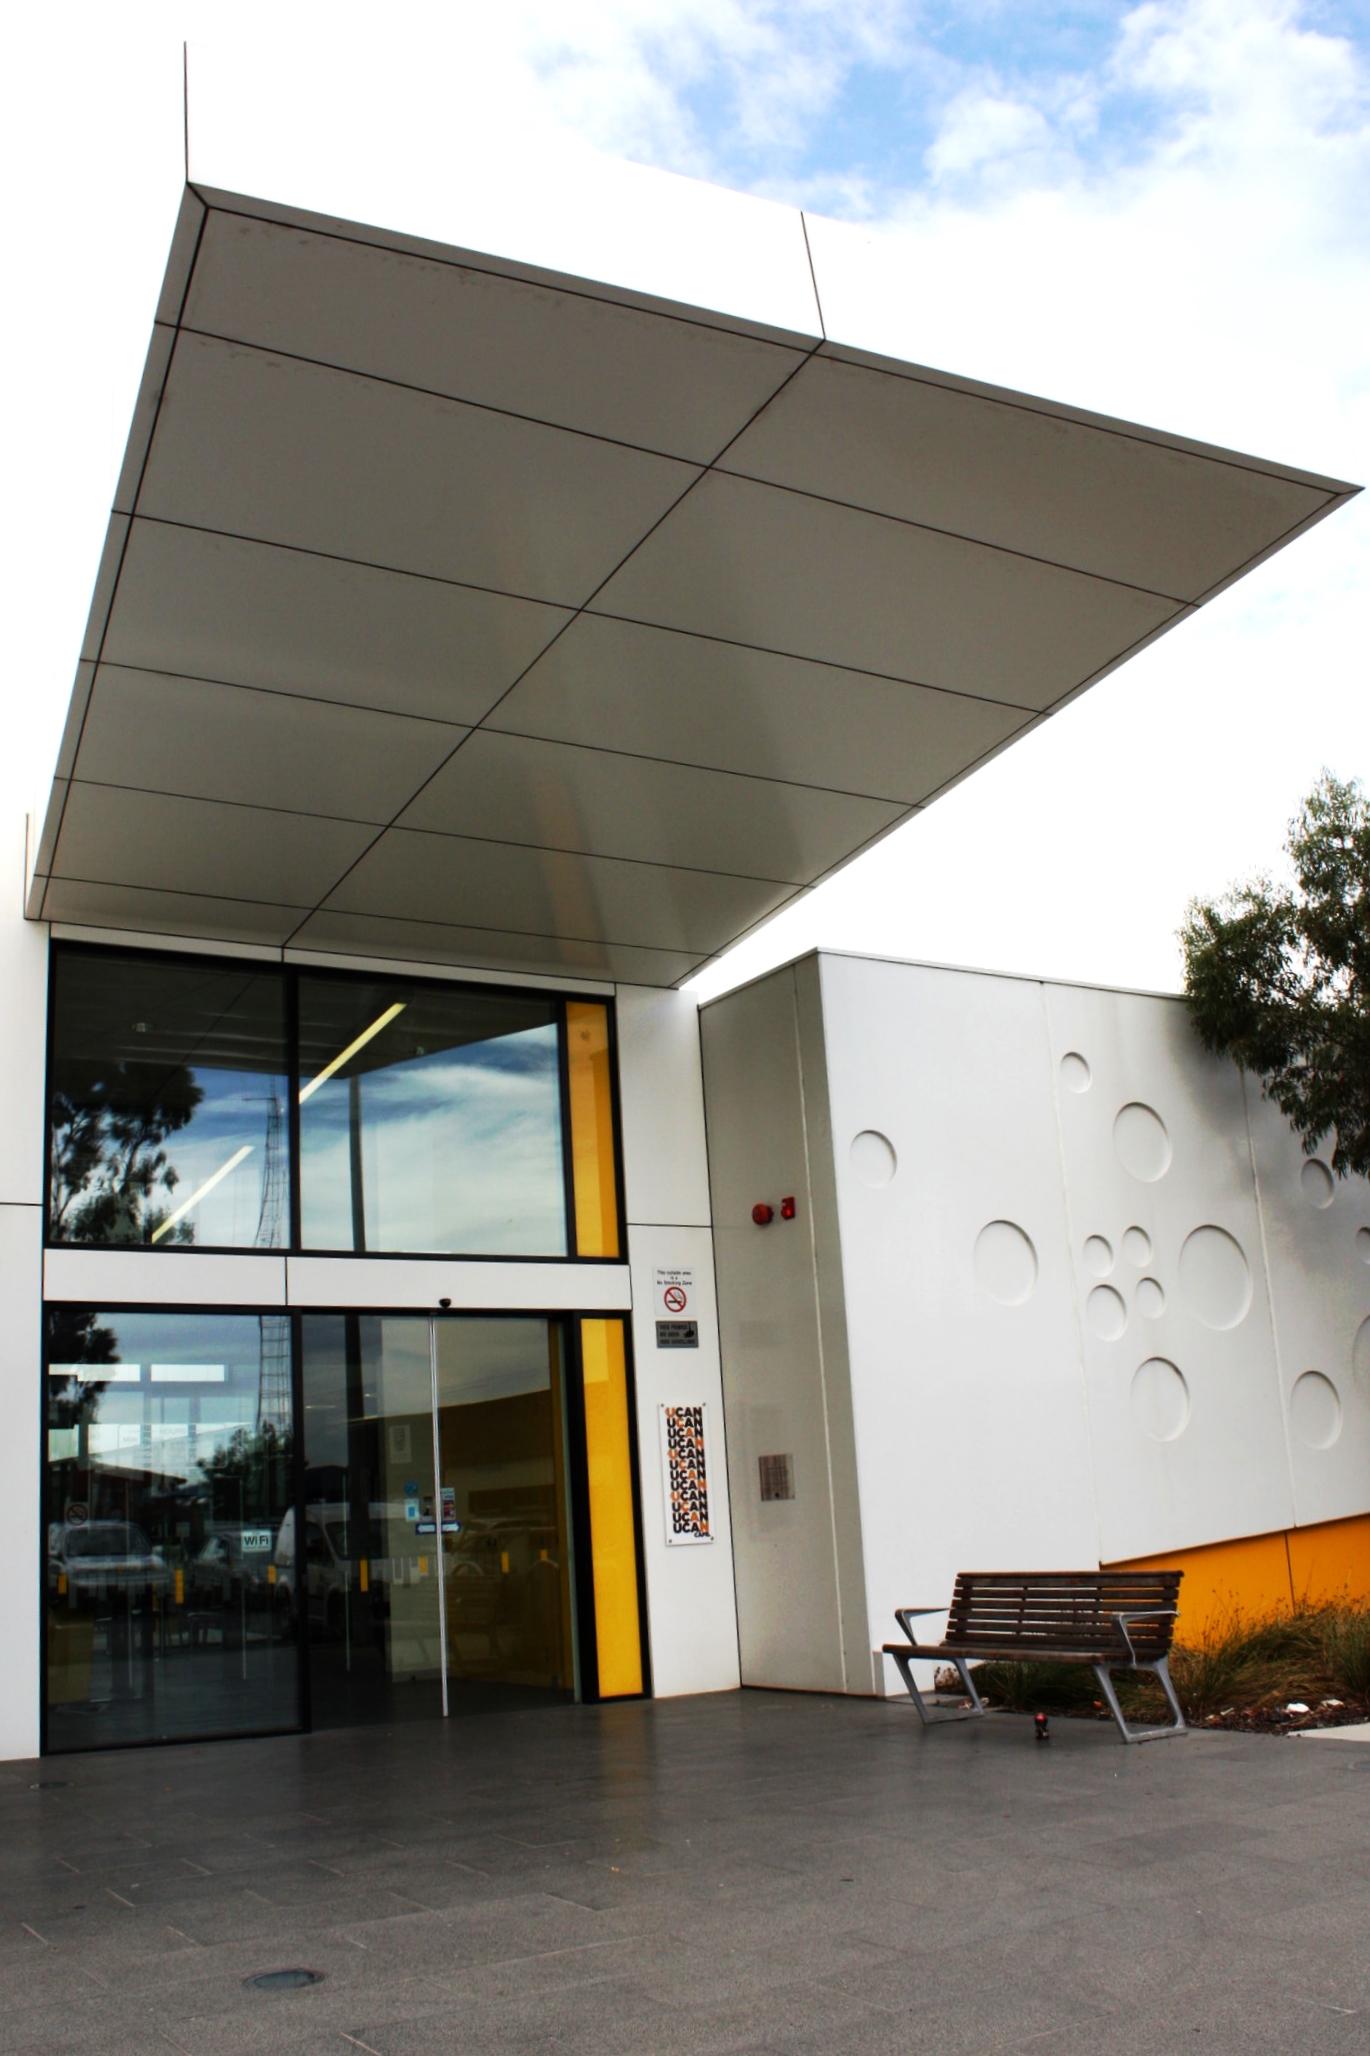 altona north community library, altona north